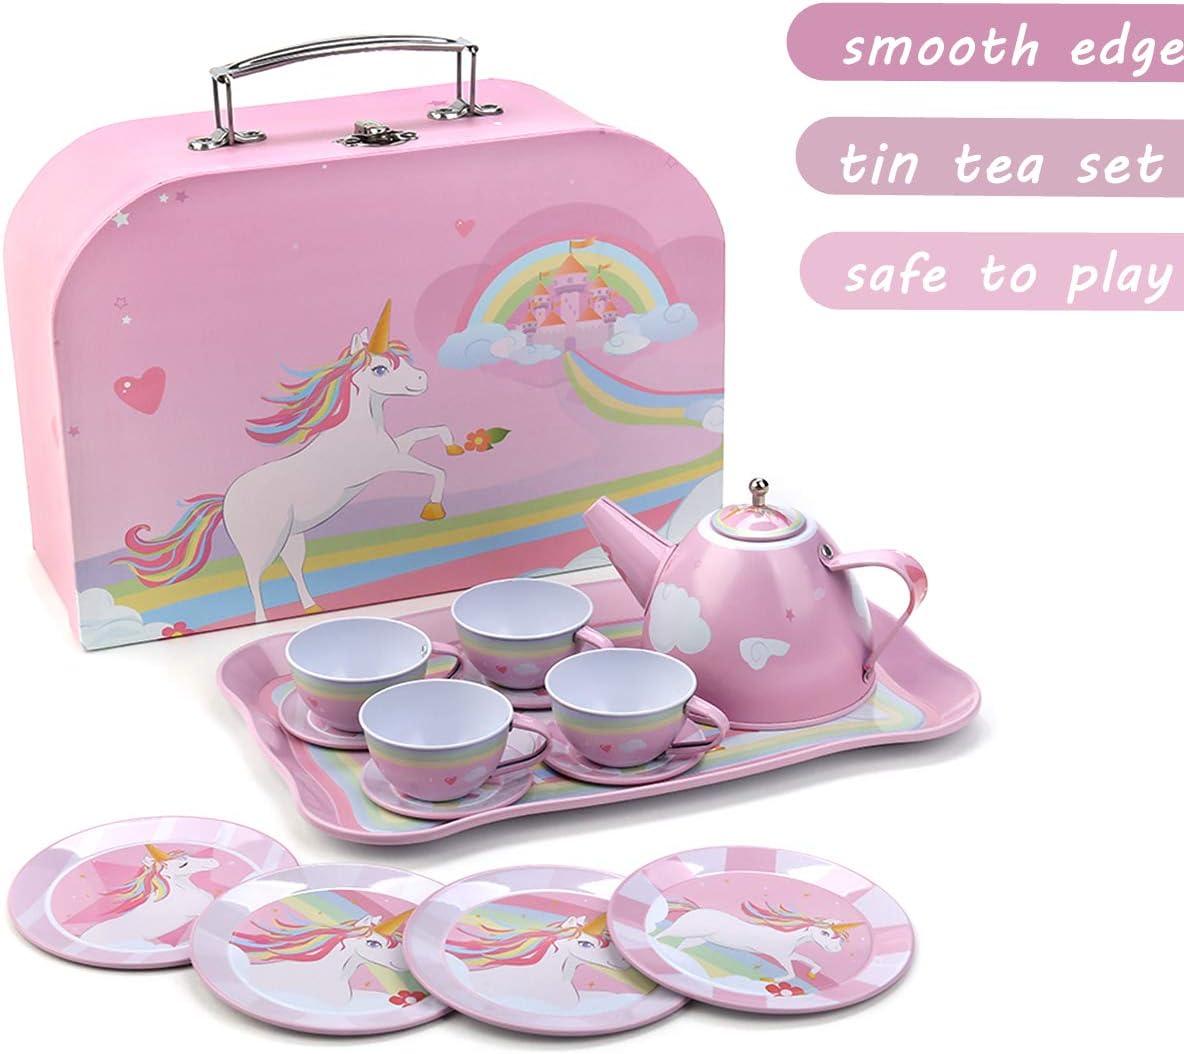 24 Piece Unicorn Kids Tea Party Set for Little Girls Princess Gift Pretend Toy Tin Tea Set with Carrying Case Princess Tea Time Kitchen Pretend Play Tea Set Toys